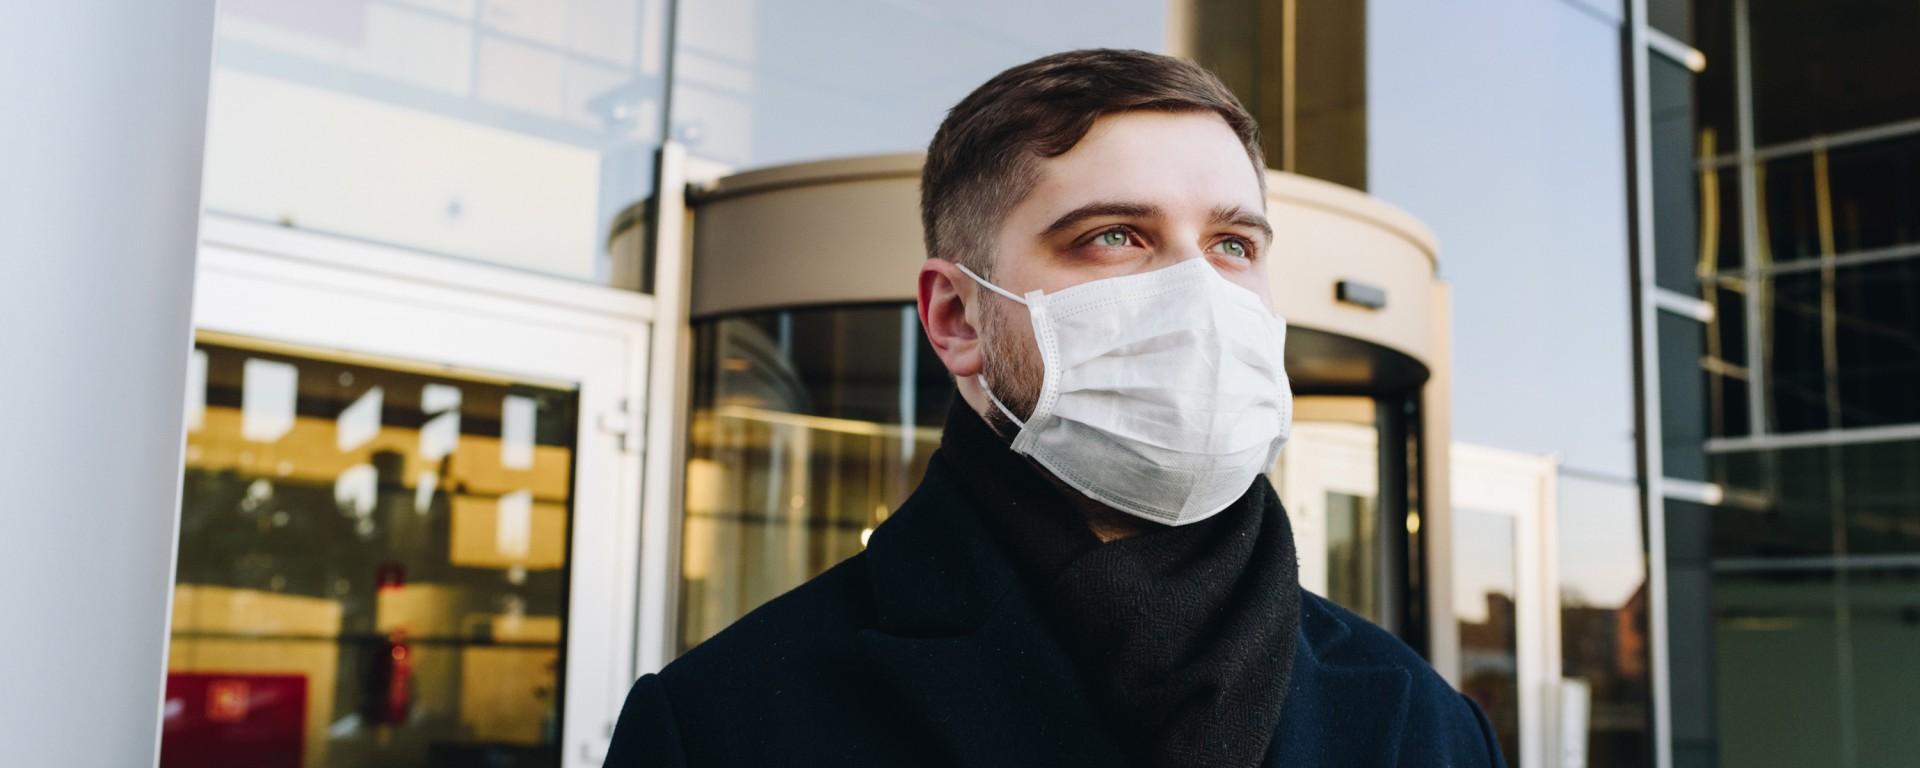 Man wearing mask, covid-19. Image: Anastasiia Chepinska on Unsplash